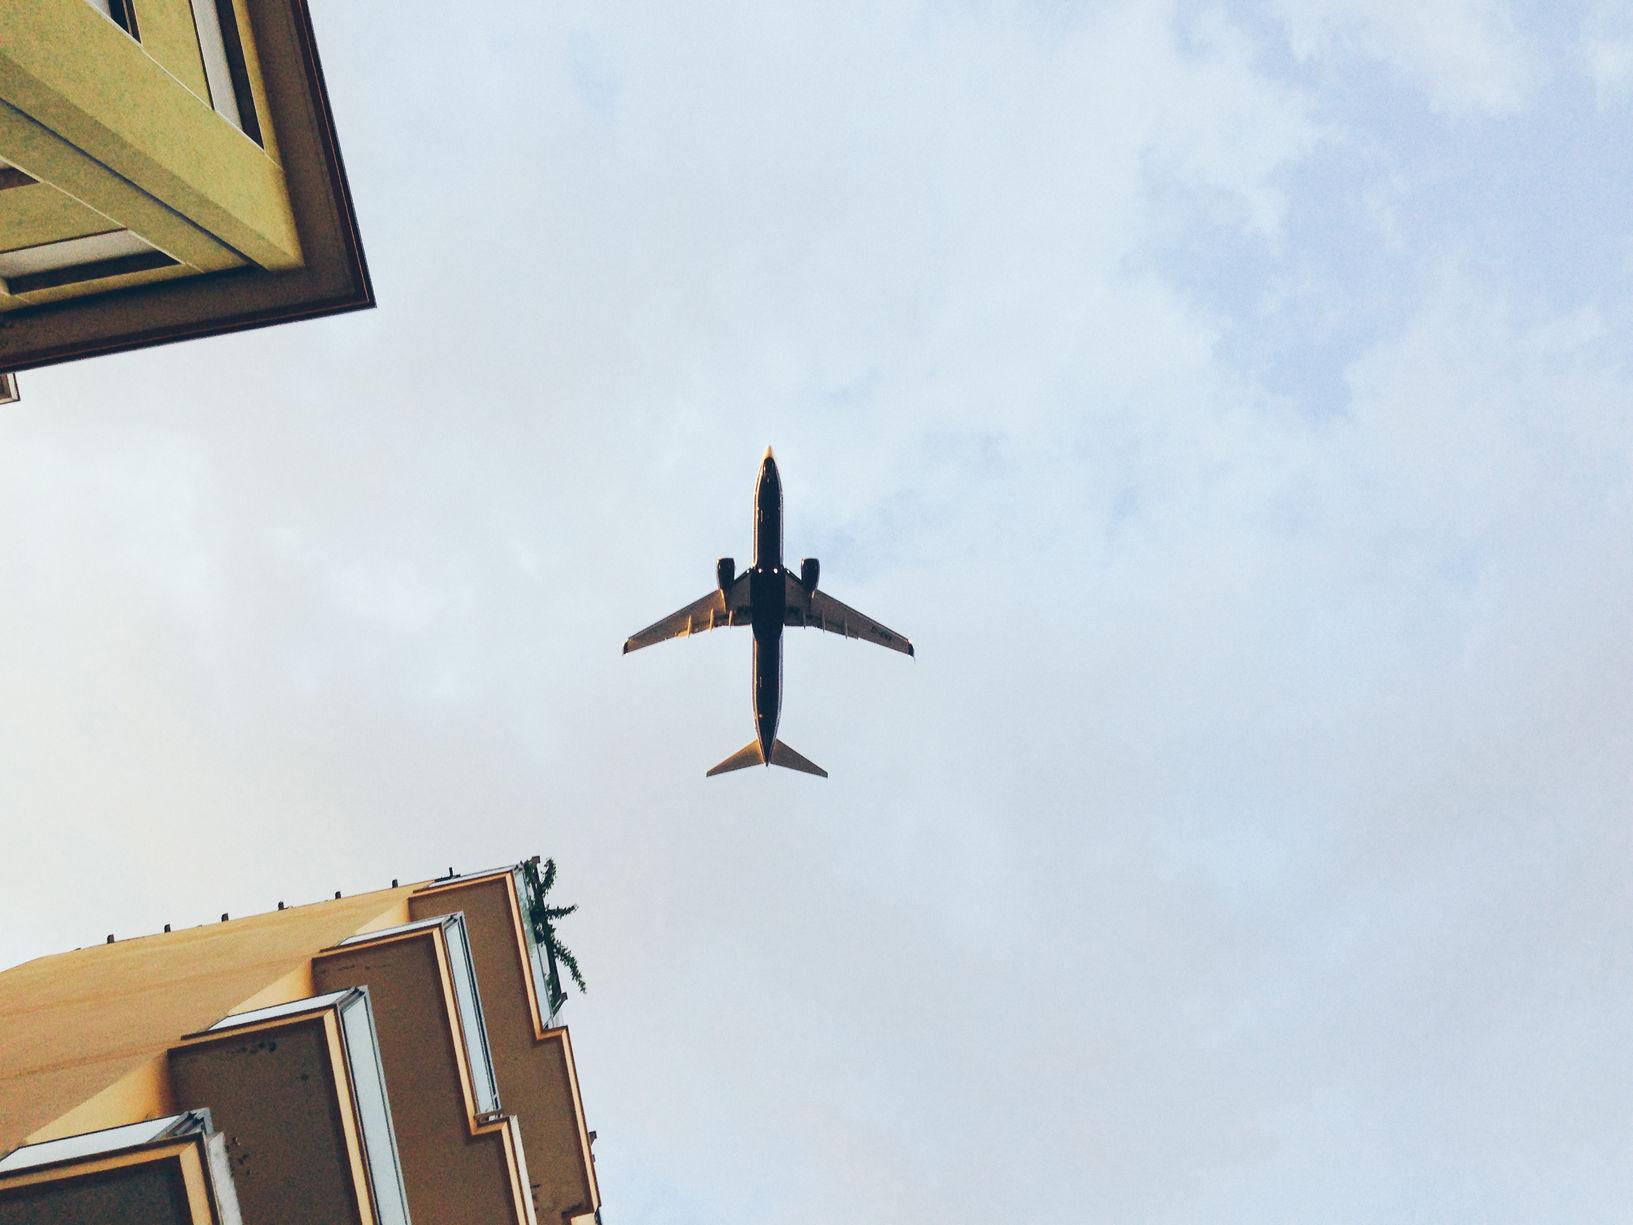 Airplane landing in Pescara (Italy) airport